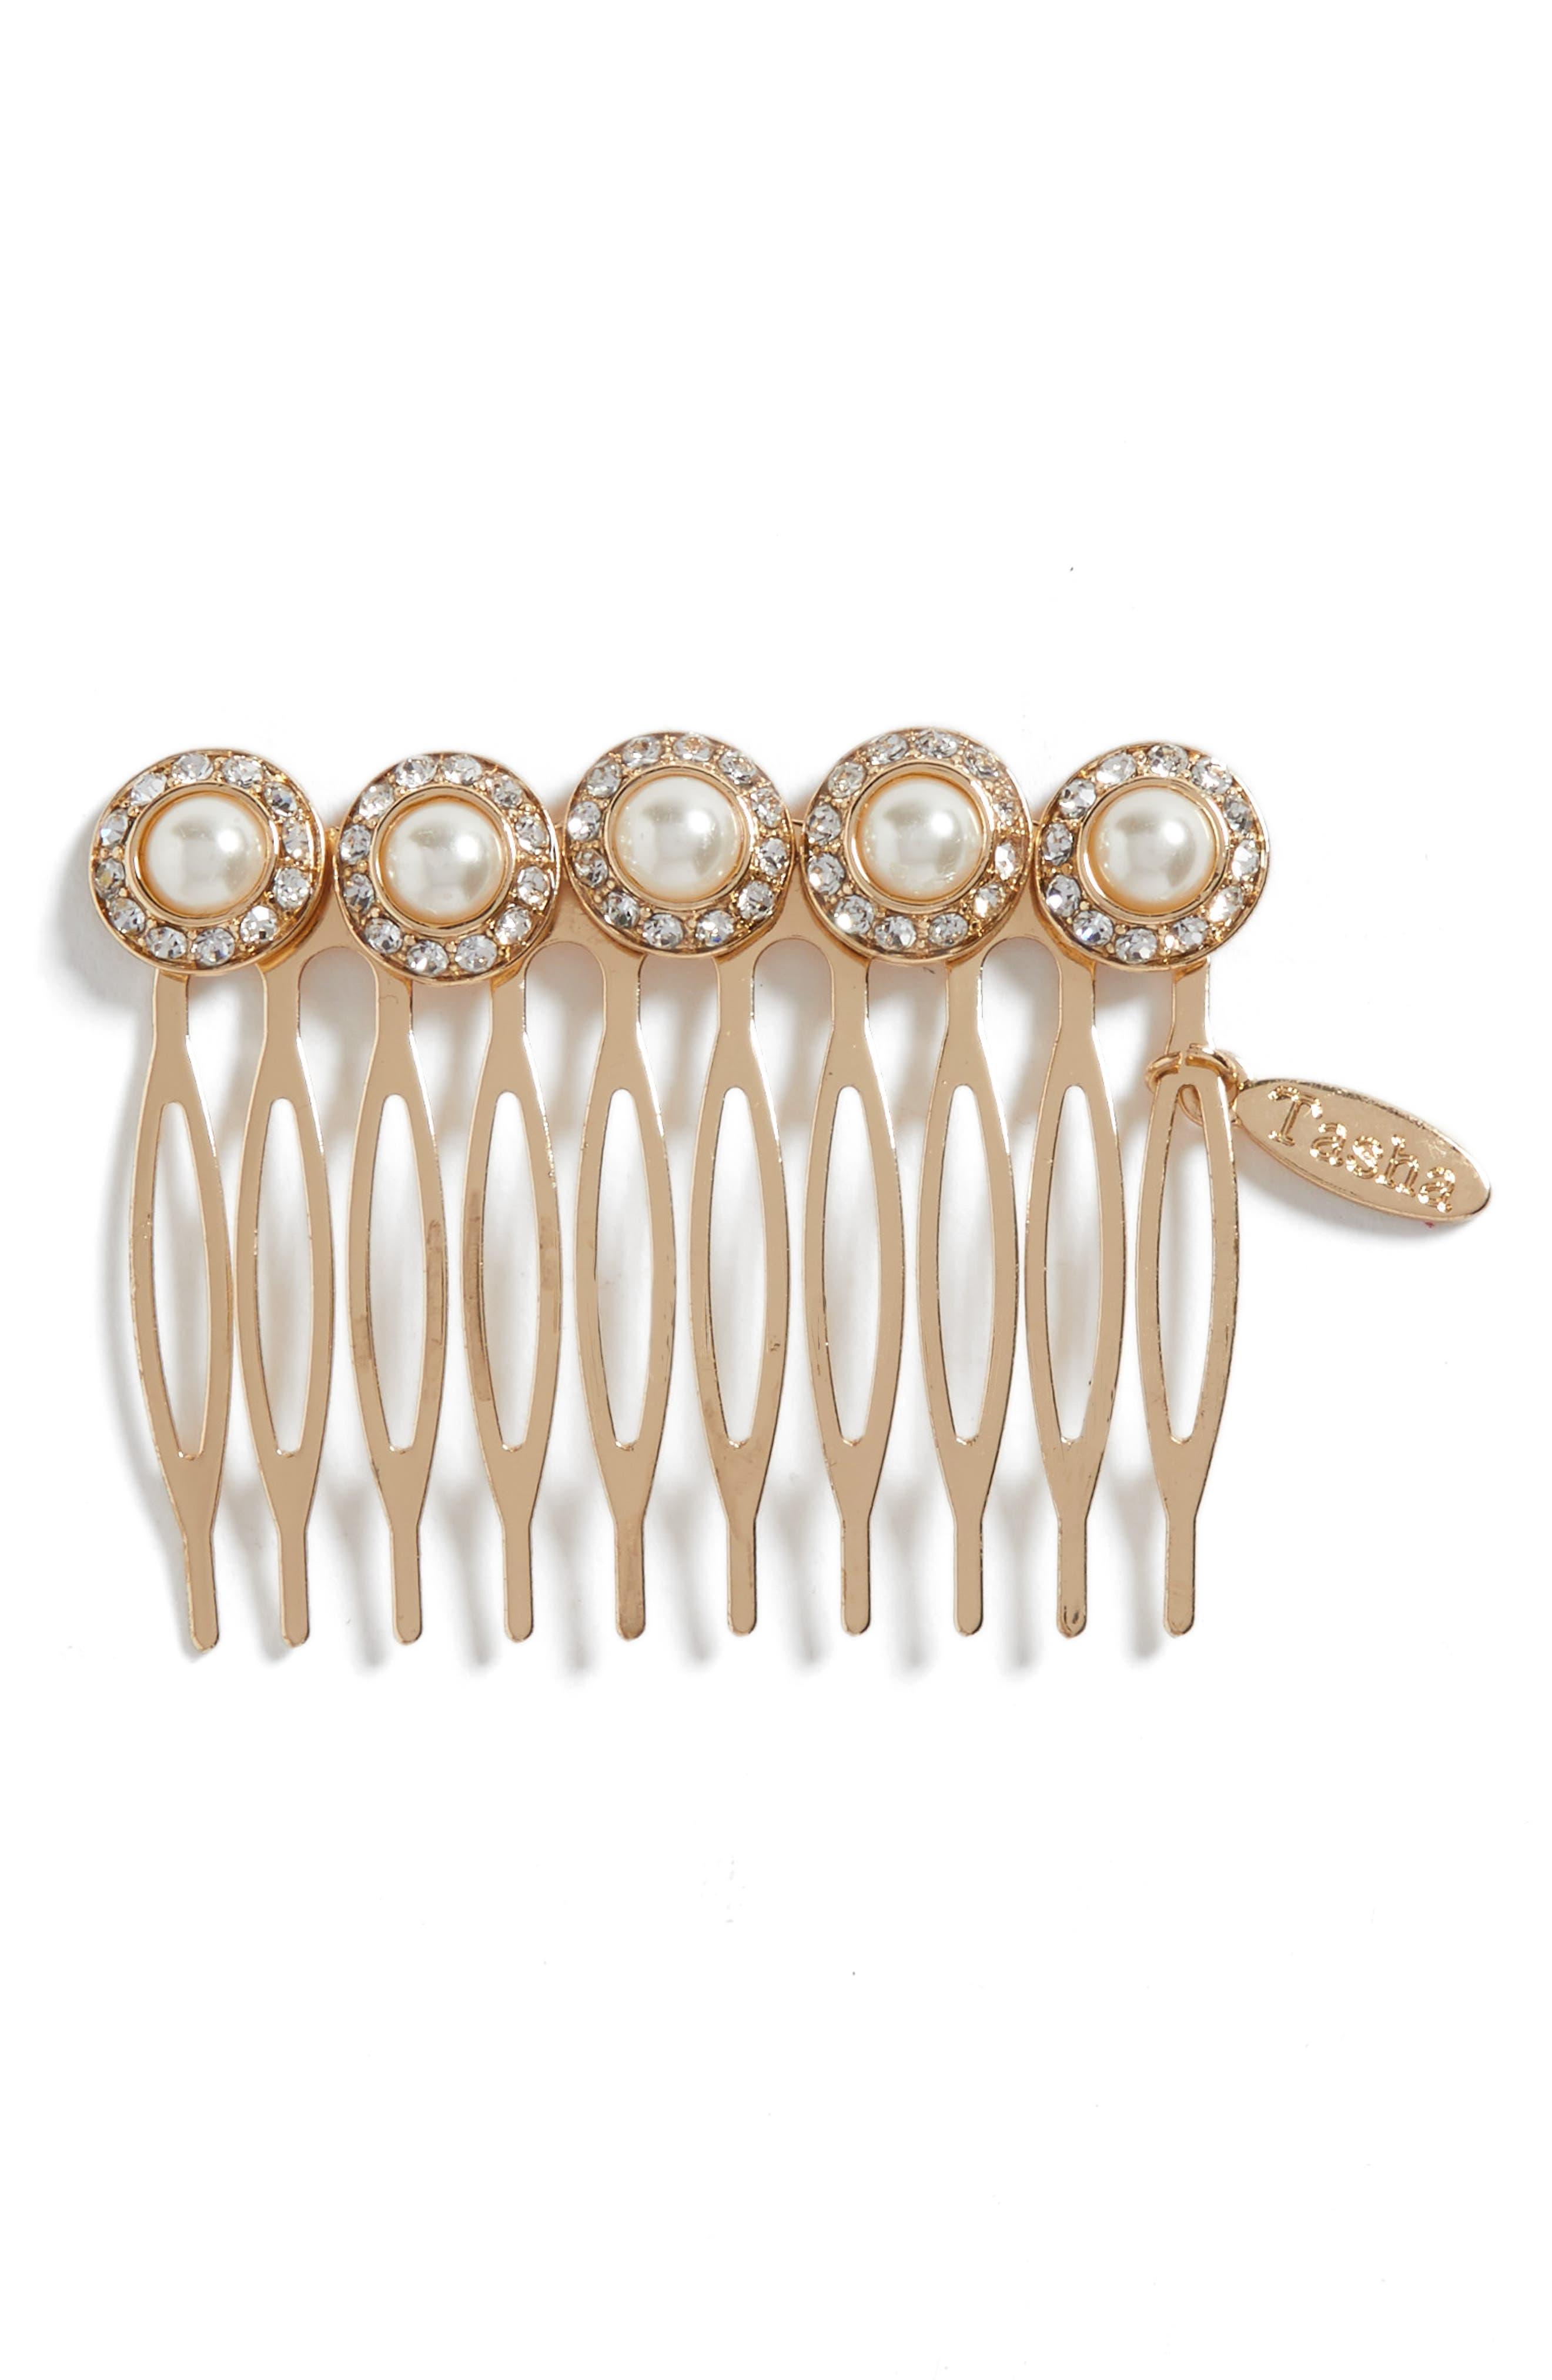 Tasha Imitation Pearl Embellished Hair Comb